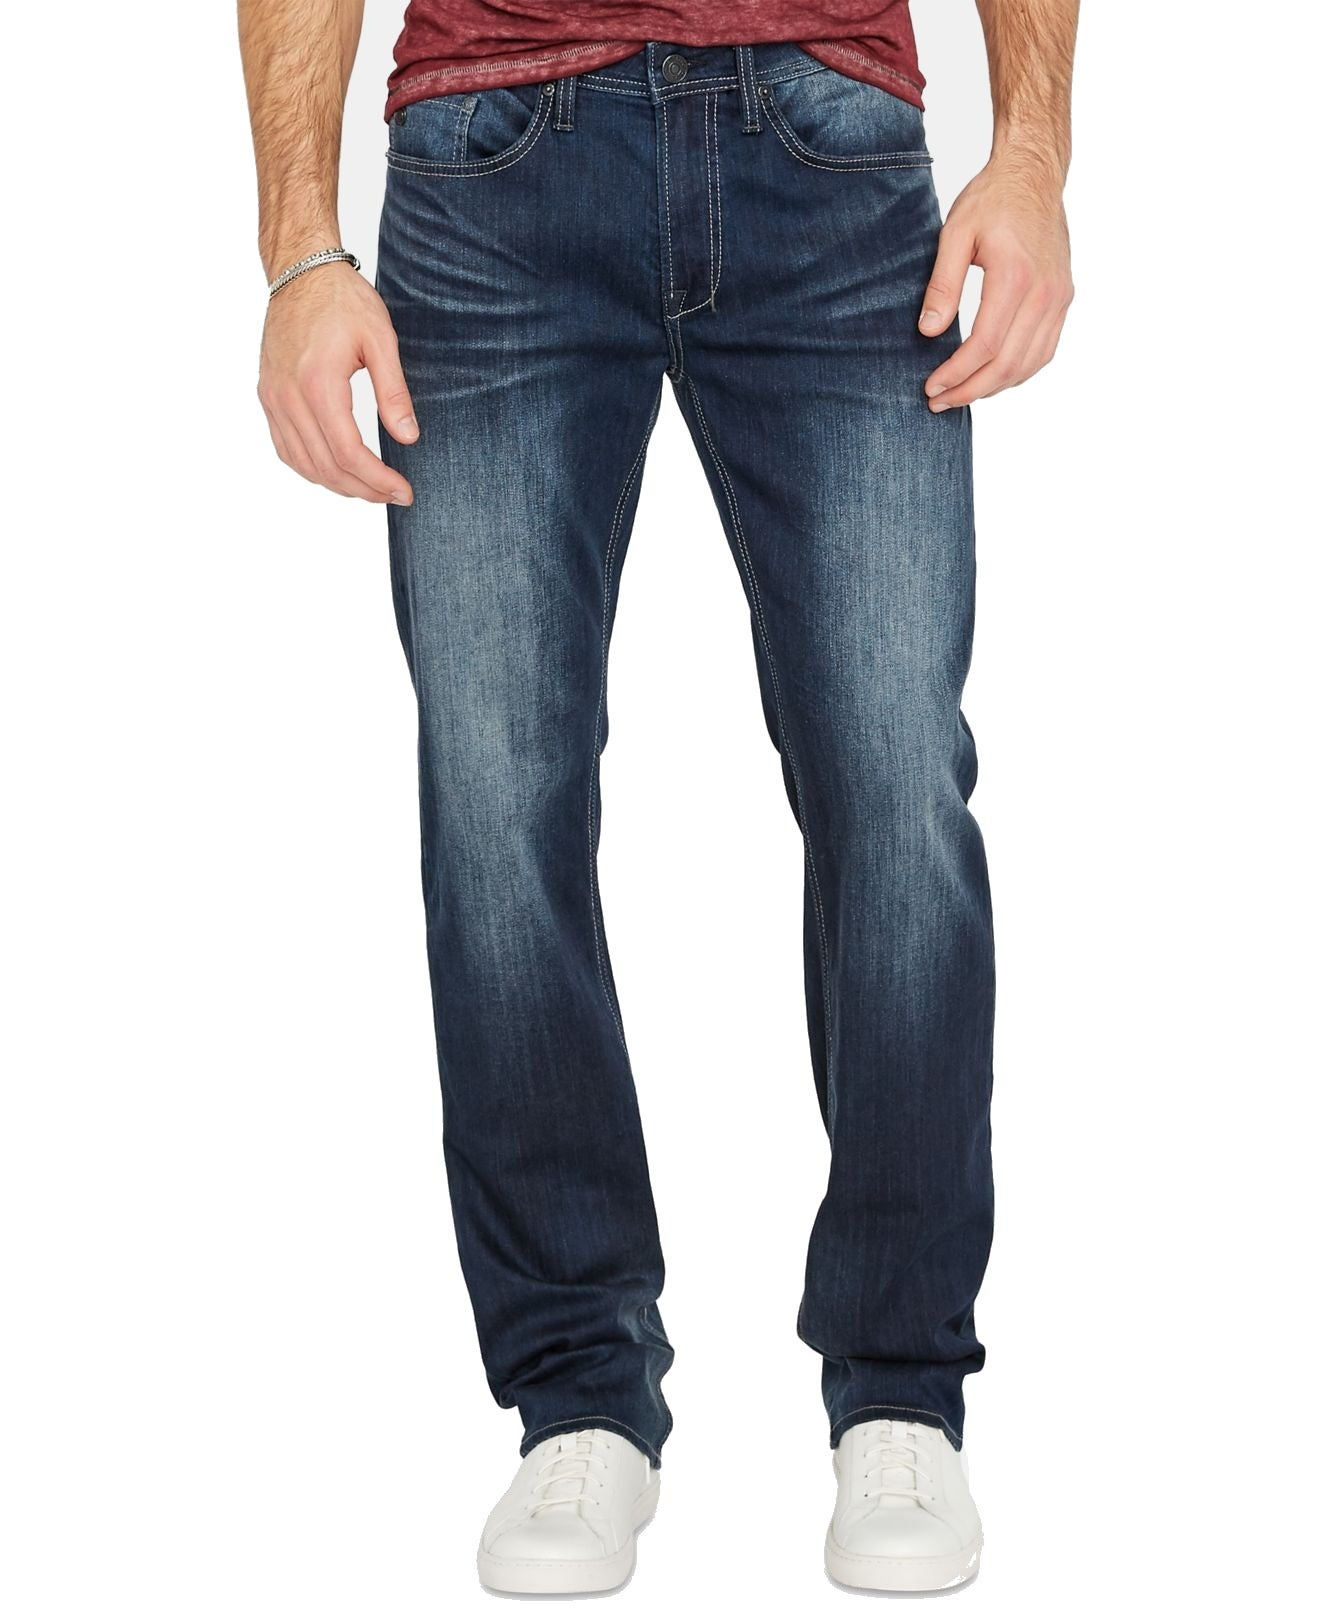 Buffalo David Bitton Mens Jeans Blue 30X34 Relaxed Straight Leg Stretch